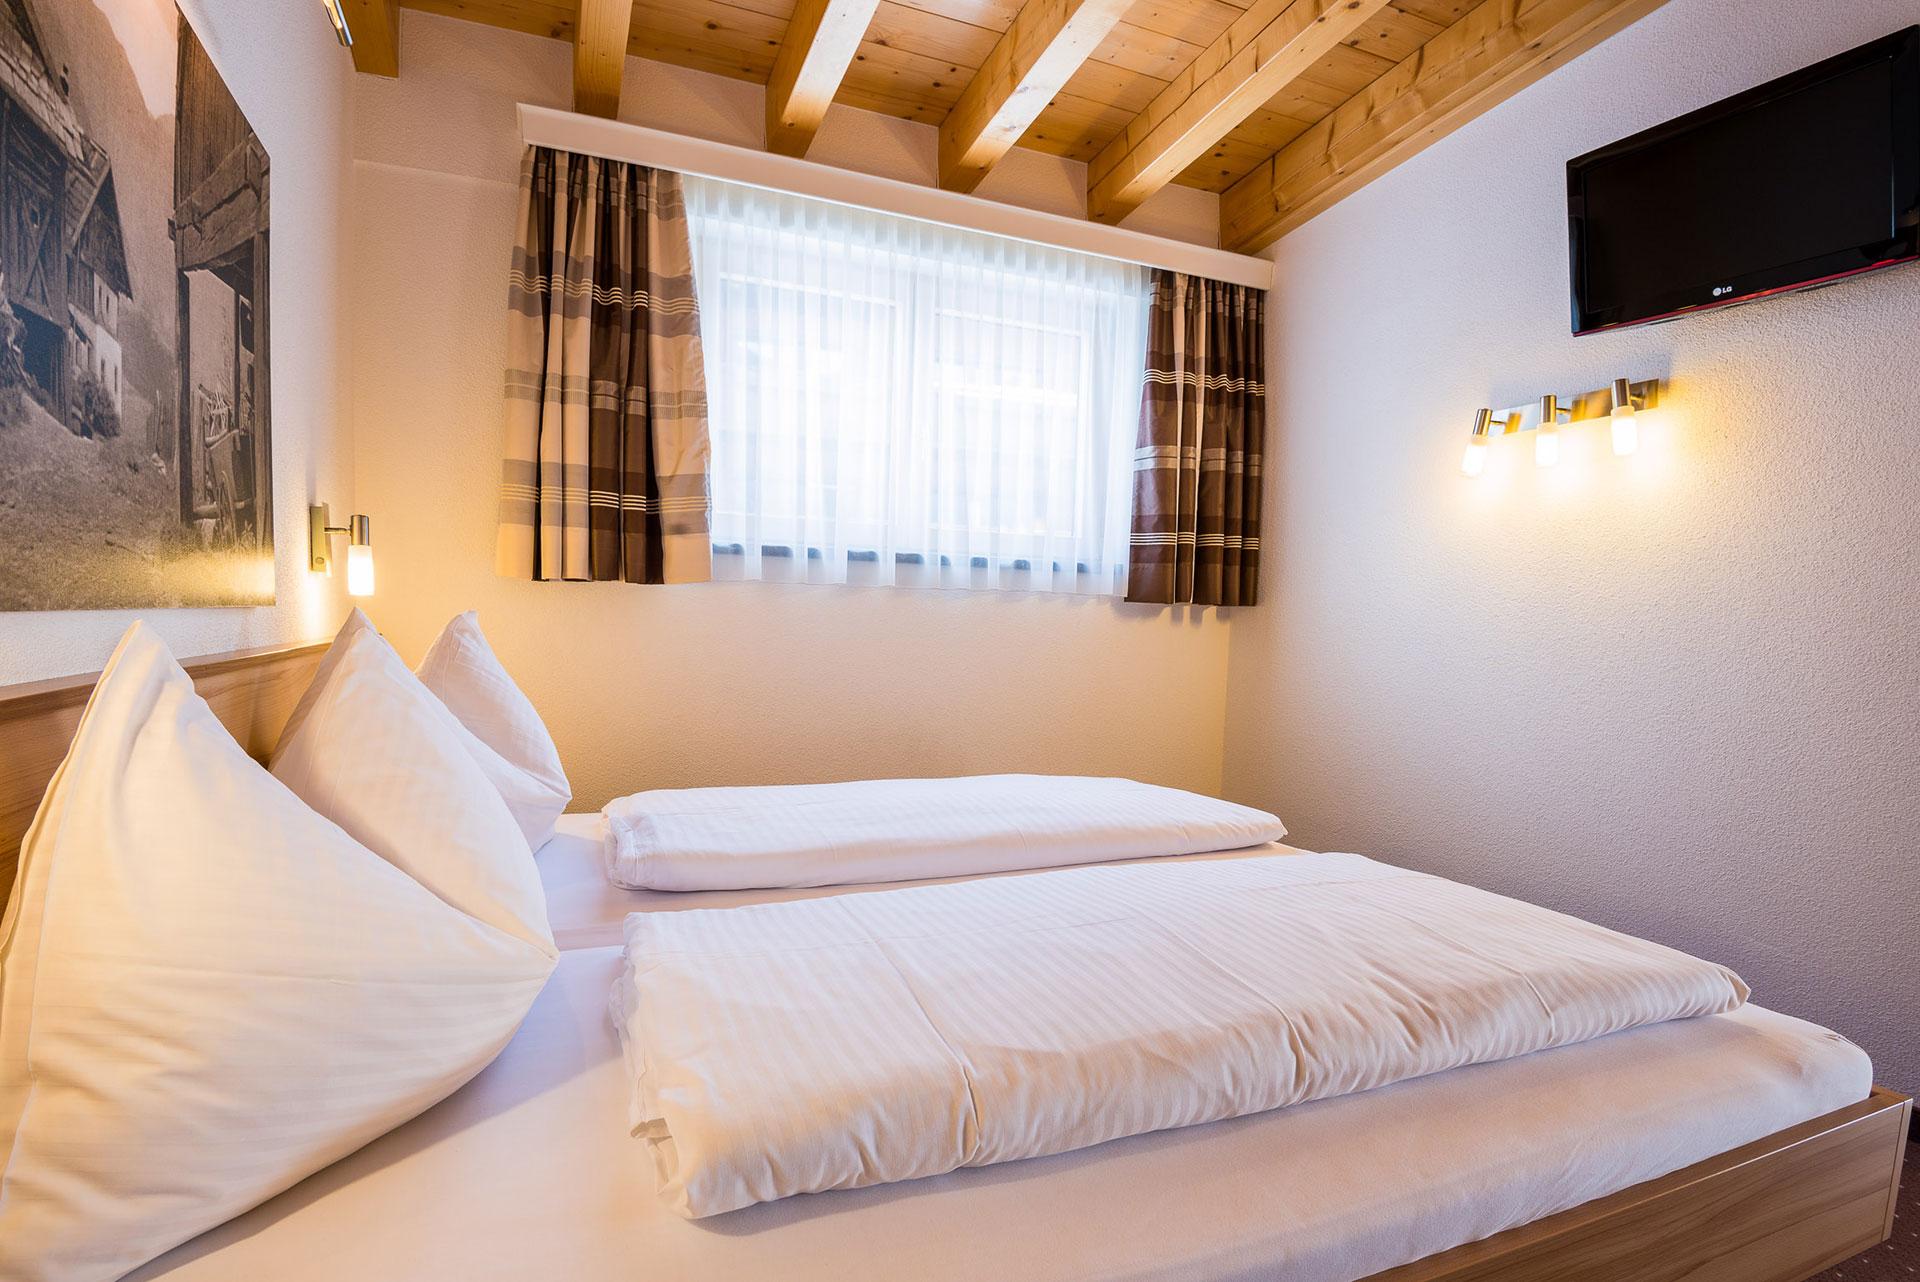 Apartment 3 Doppelbettzimmer